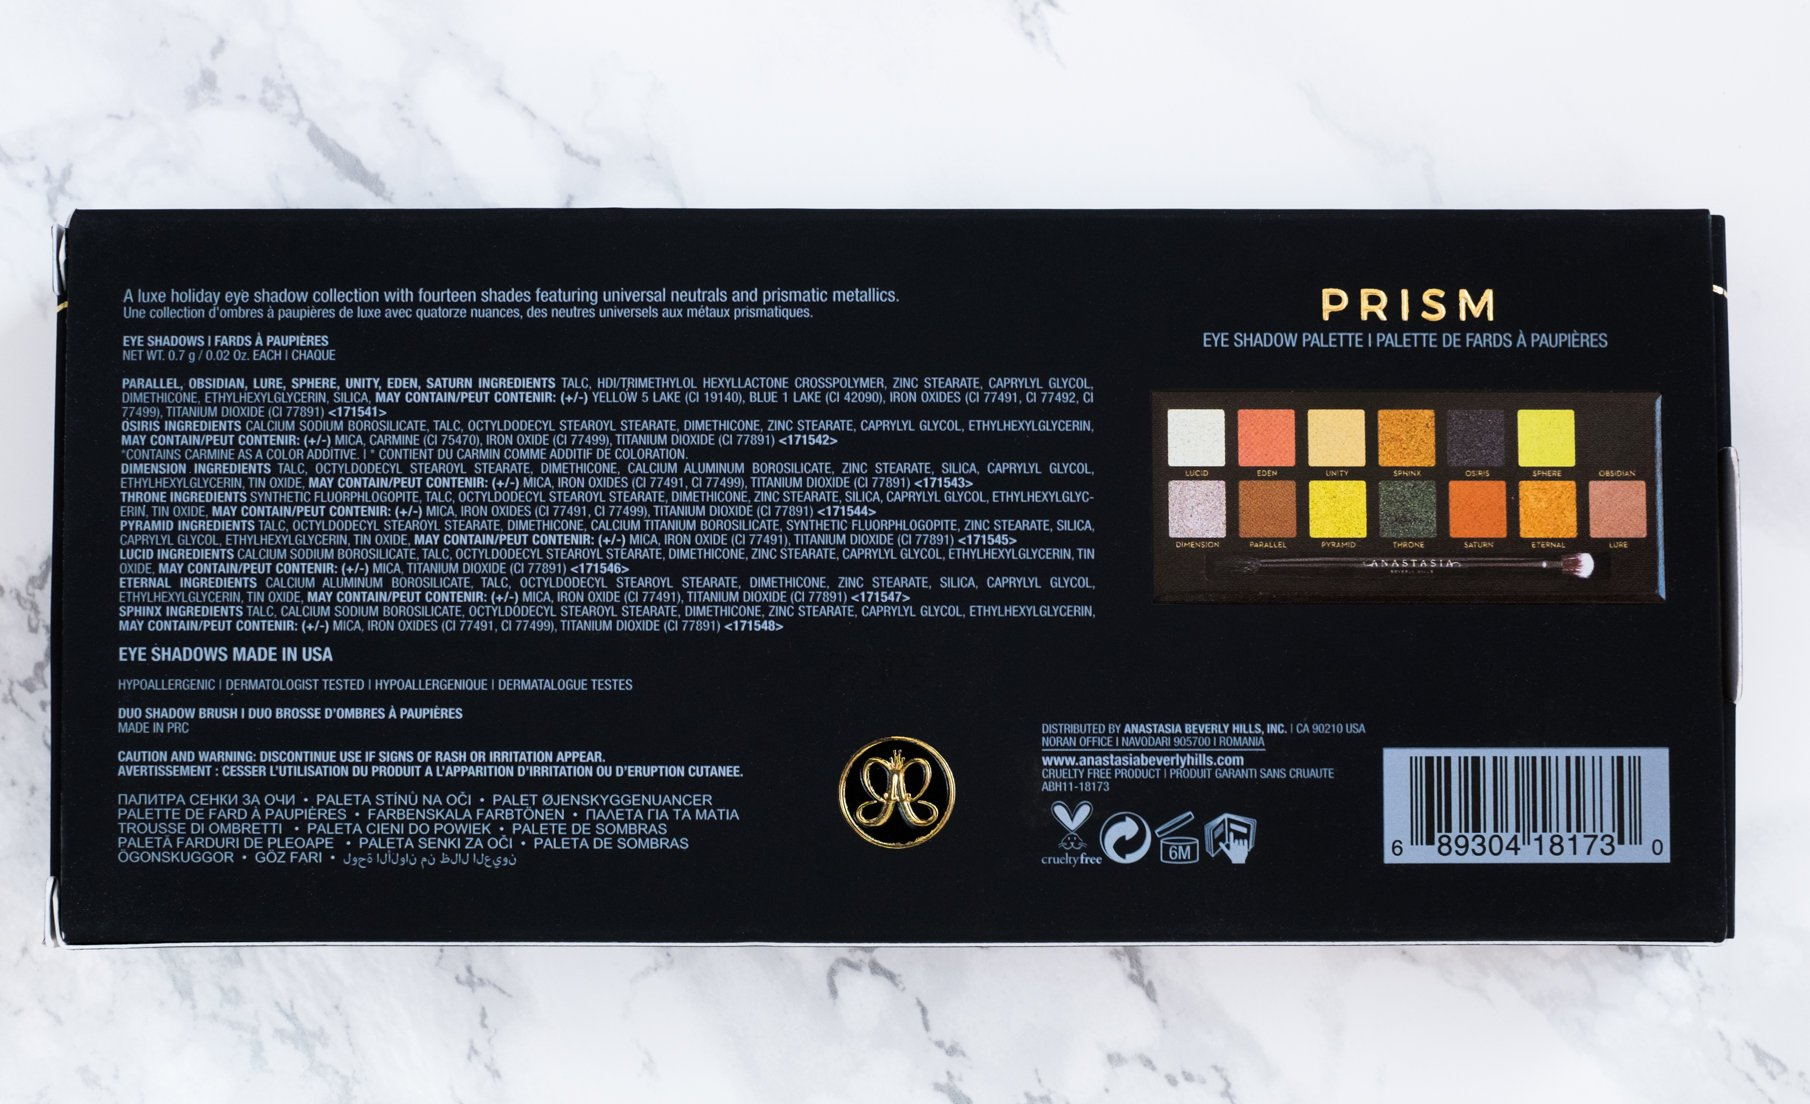 sunkissedblush-anastasia-beverly-hills-abh-prism-eyeshadow-palette (1 of 8)